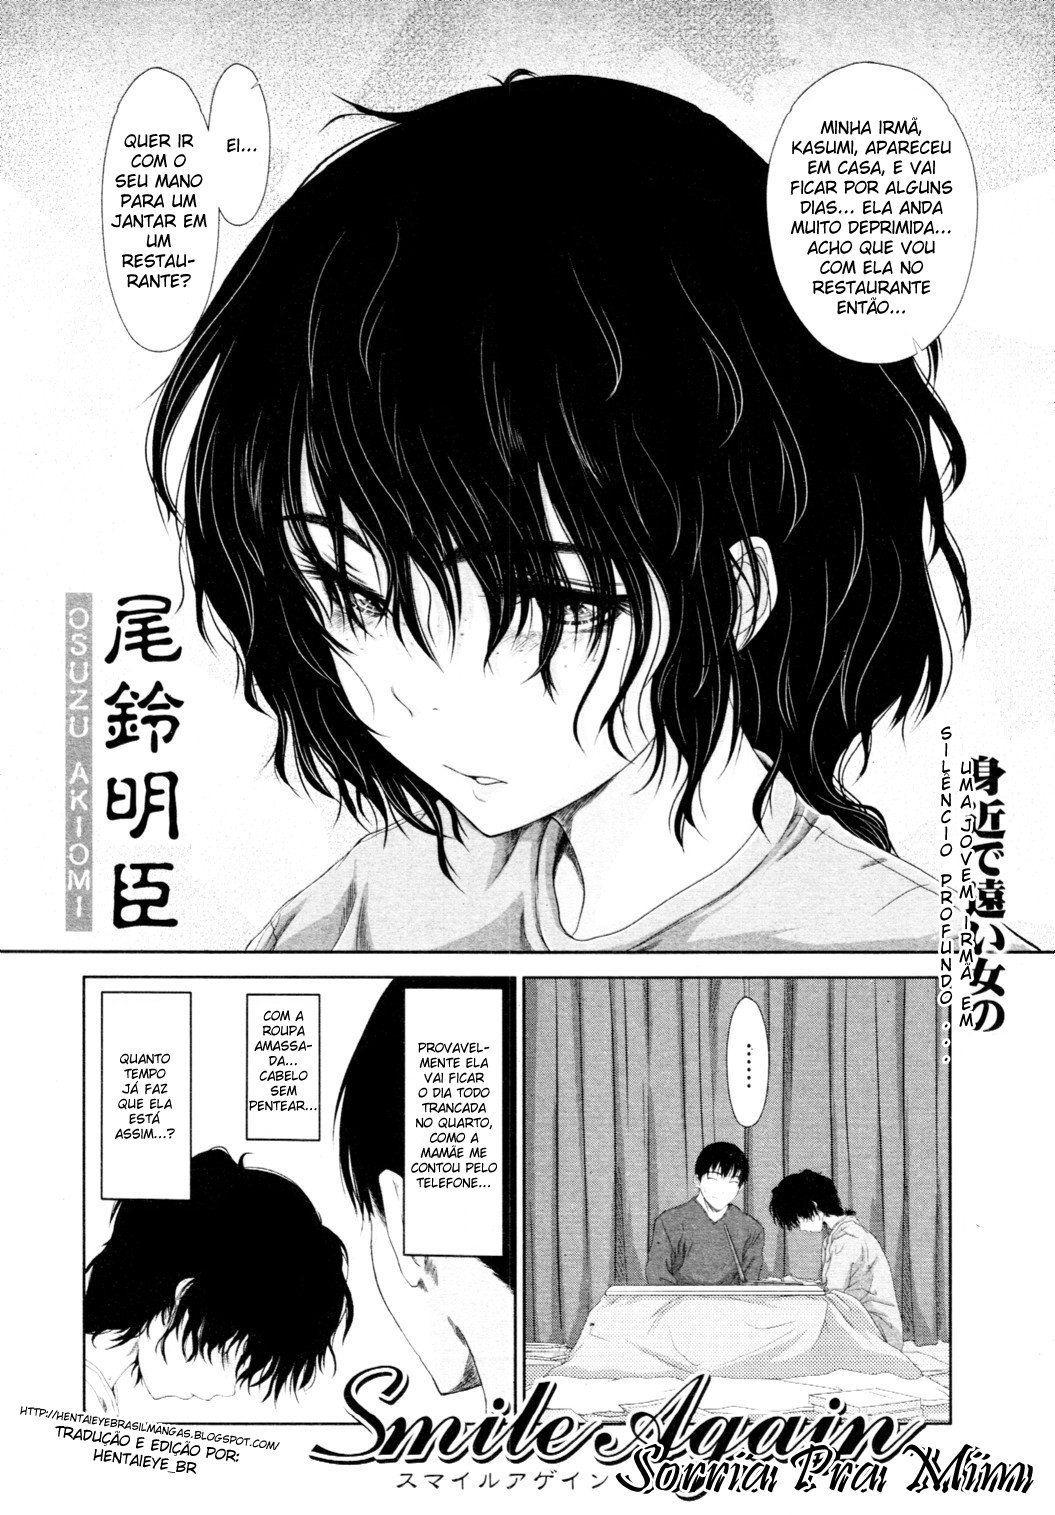 hentaihome.net-Kazumi-à-irmã-deprimida-2